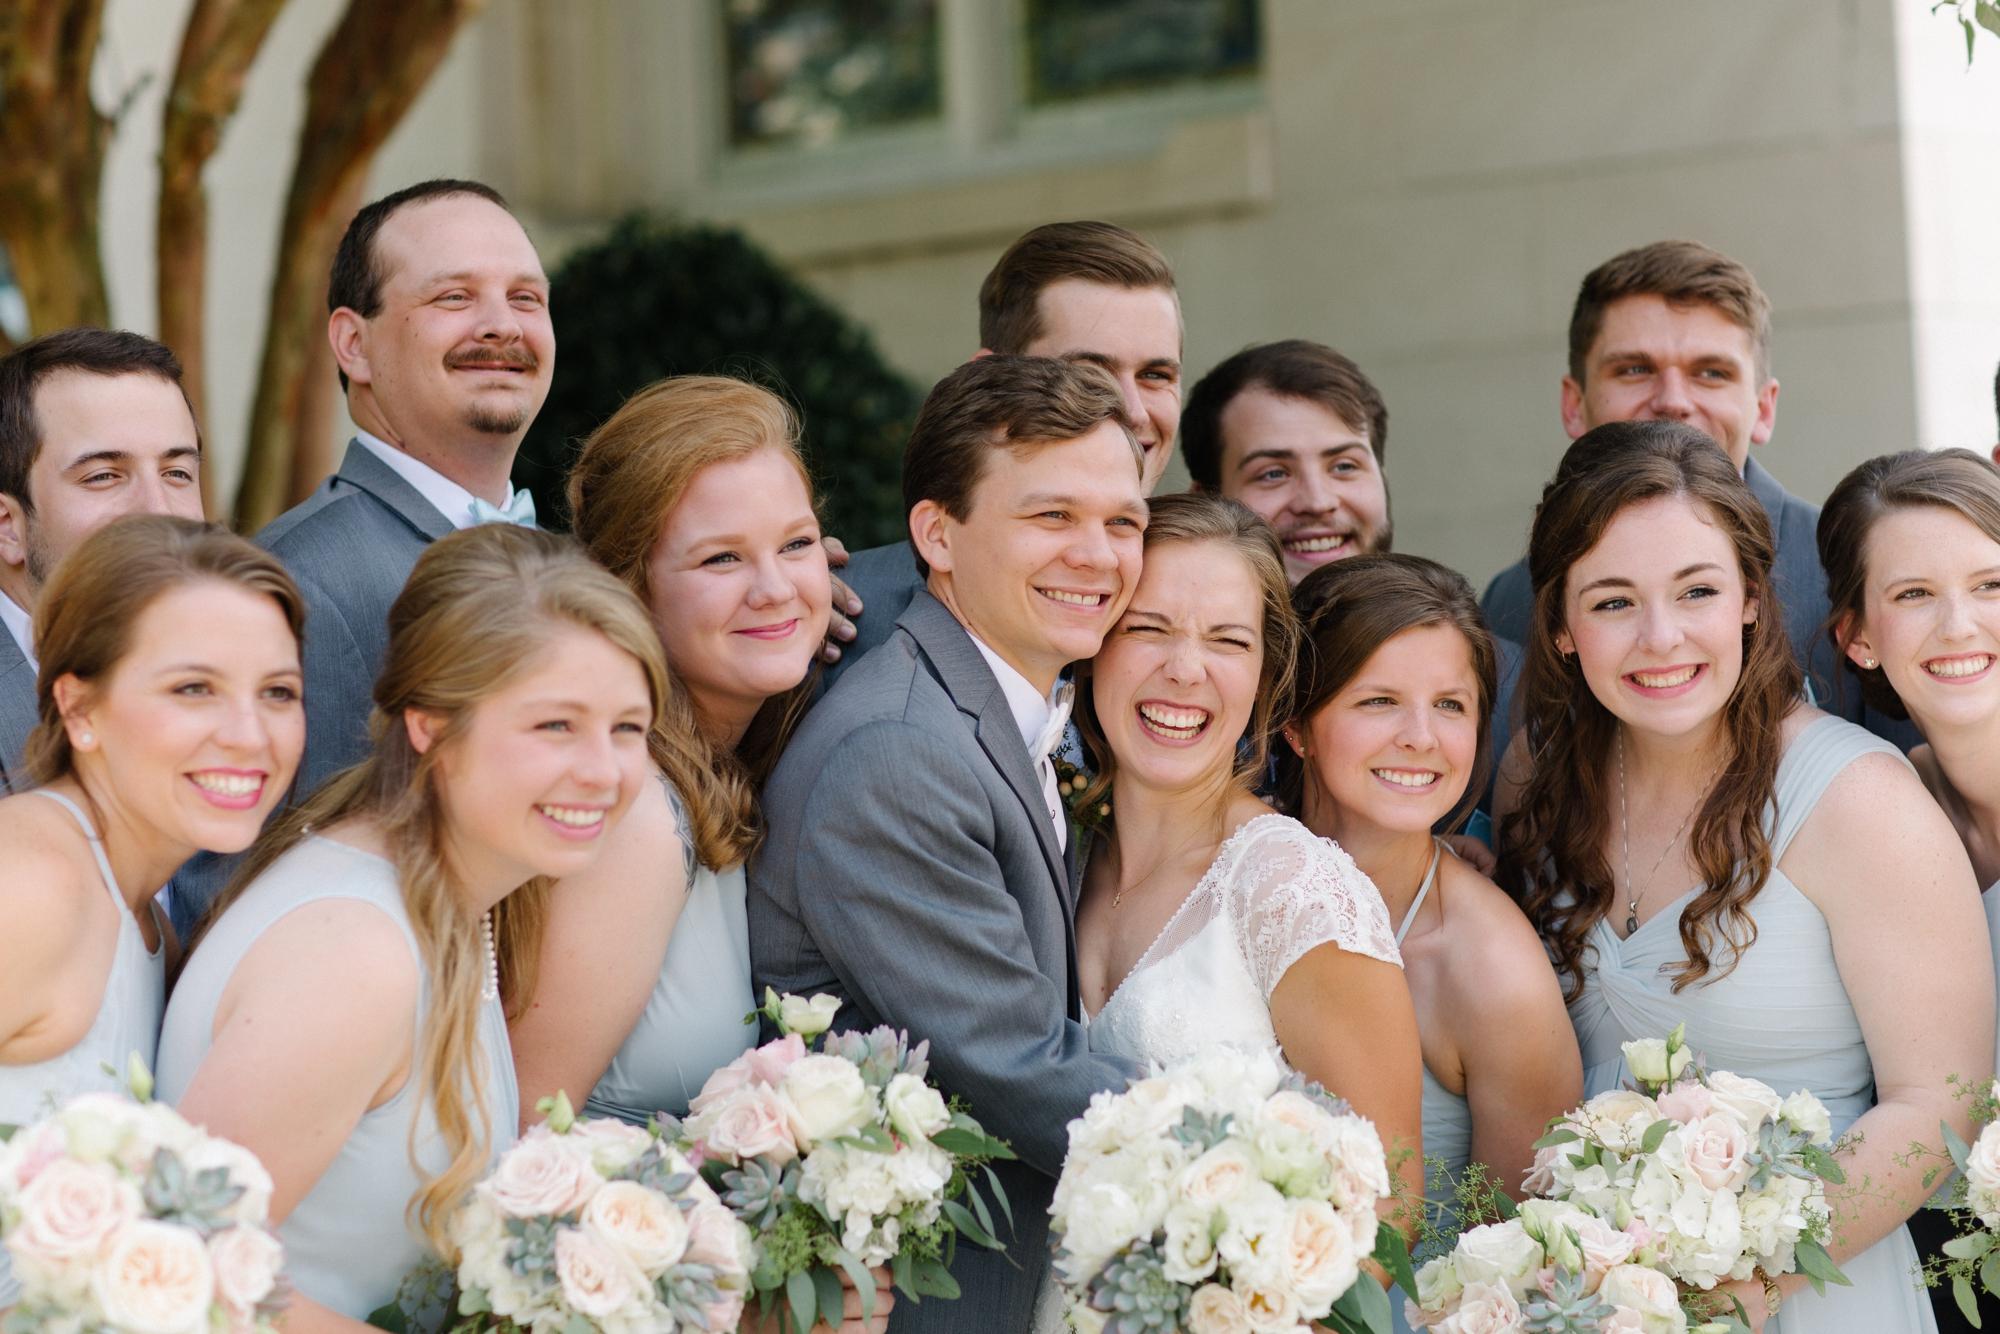 New_Orleans_Wedding_Photographer_1611.jpg